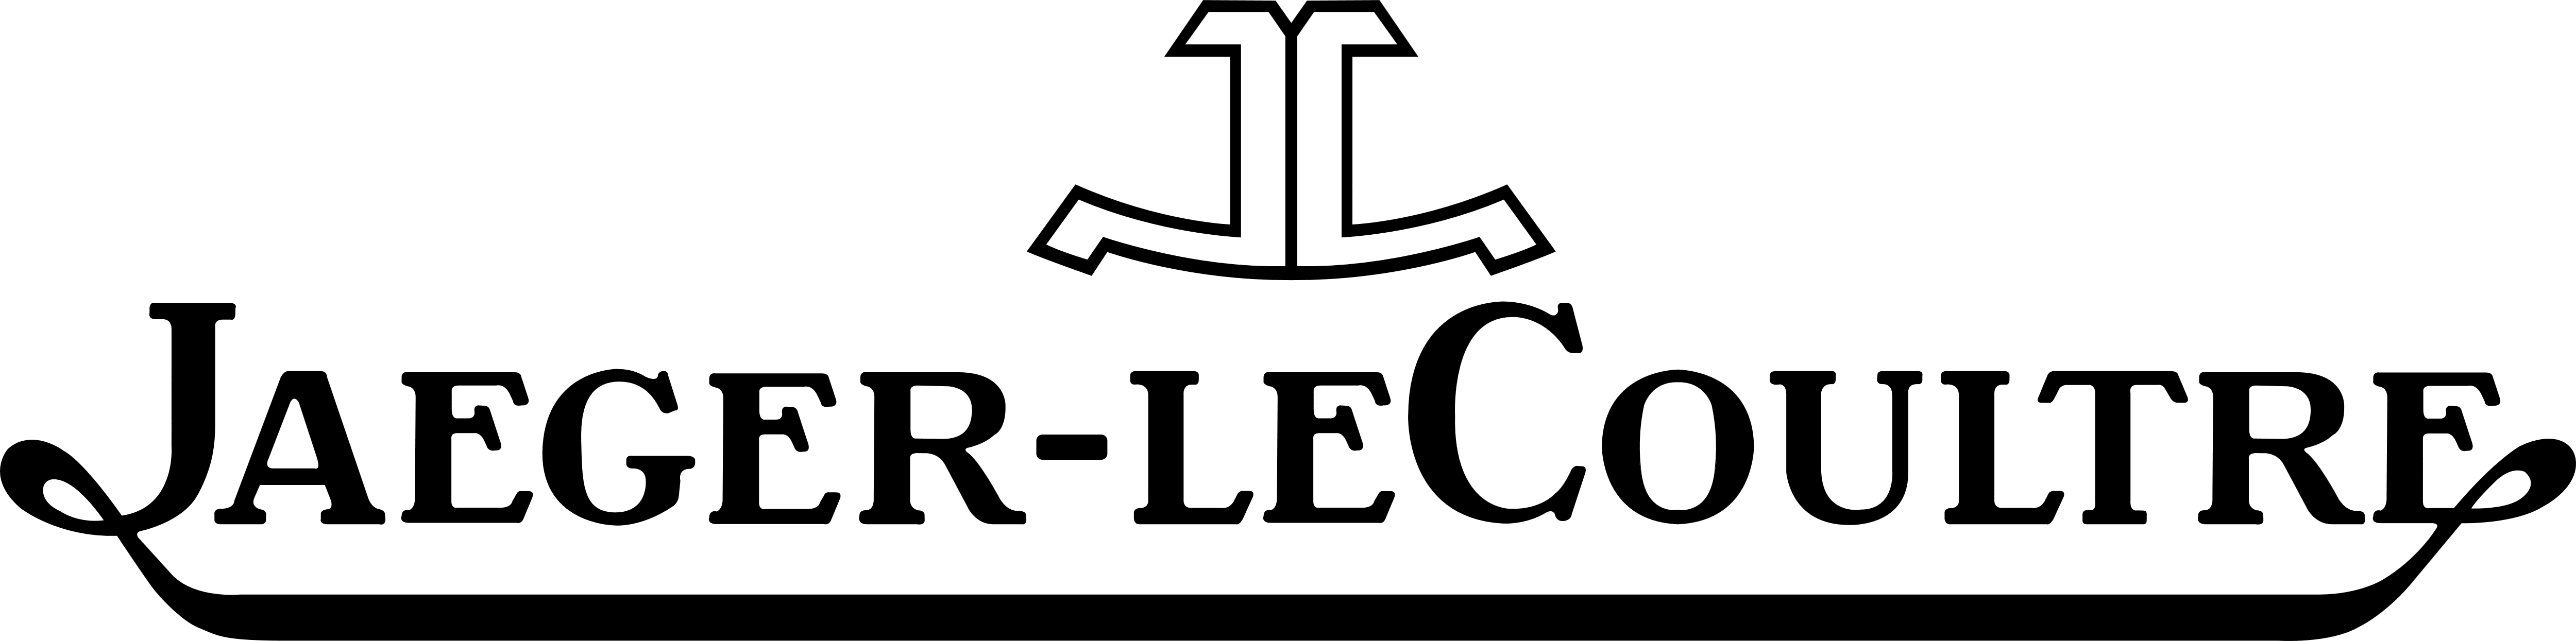 jaeger lecoultre logo - photo #1